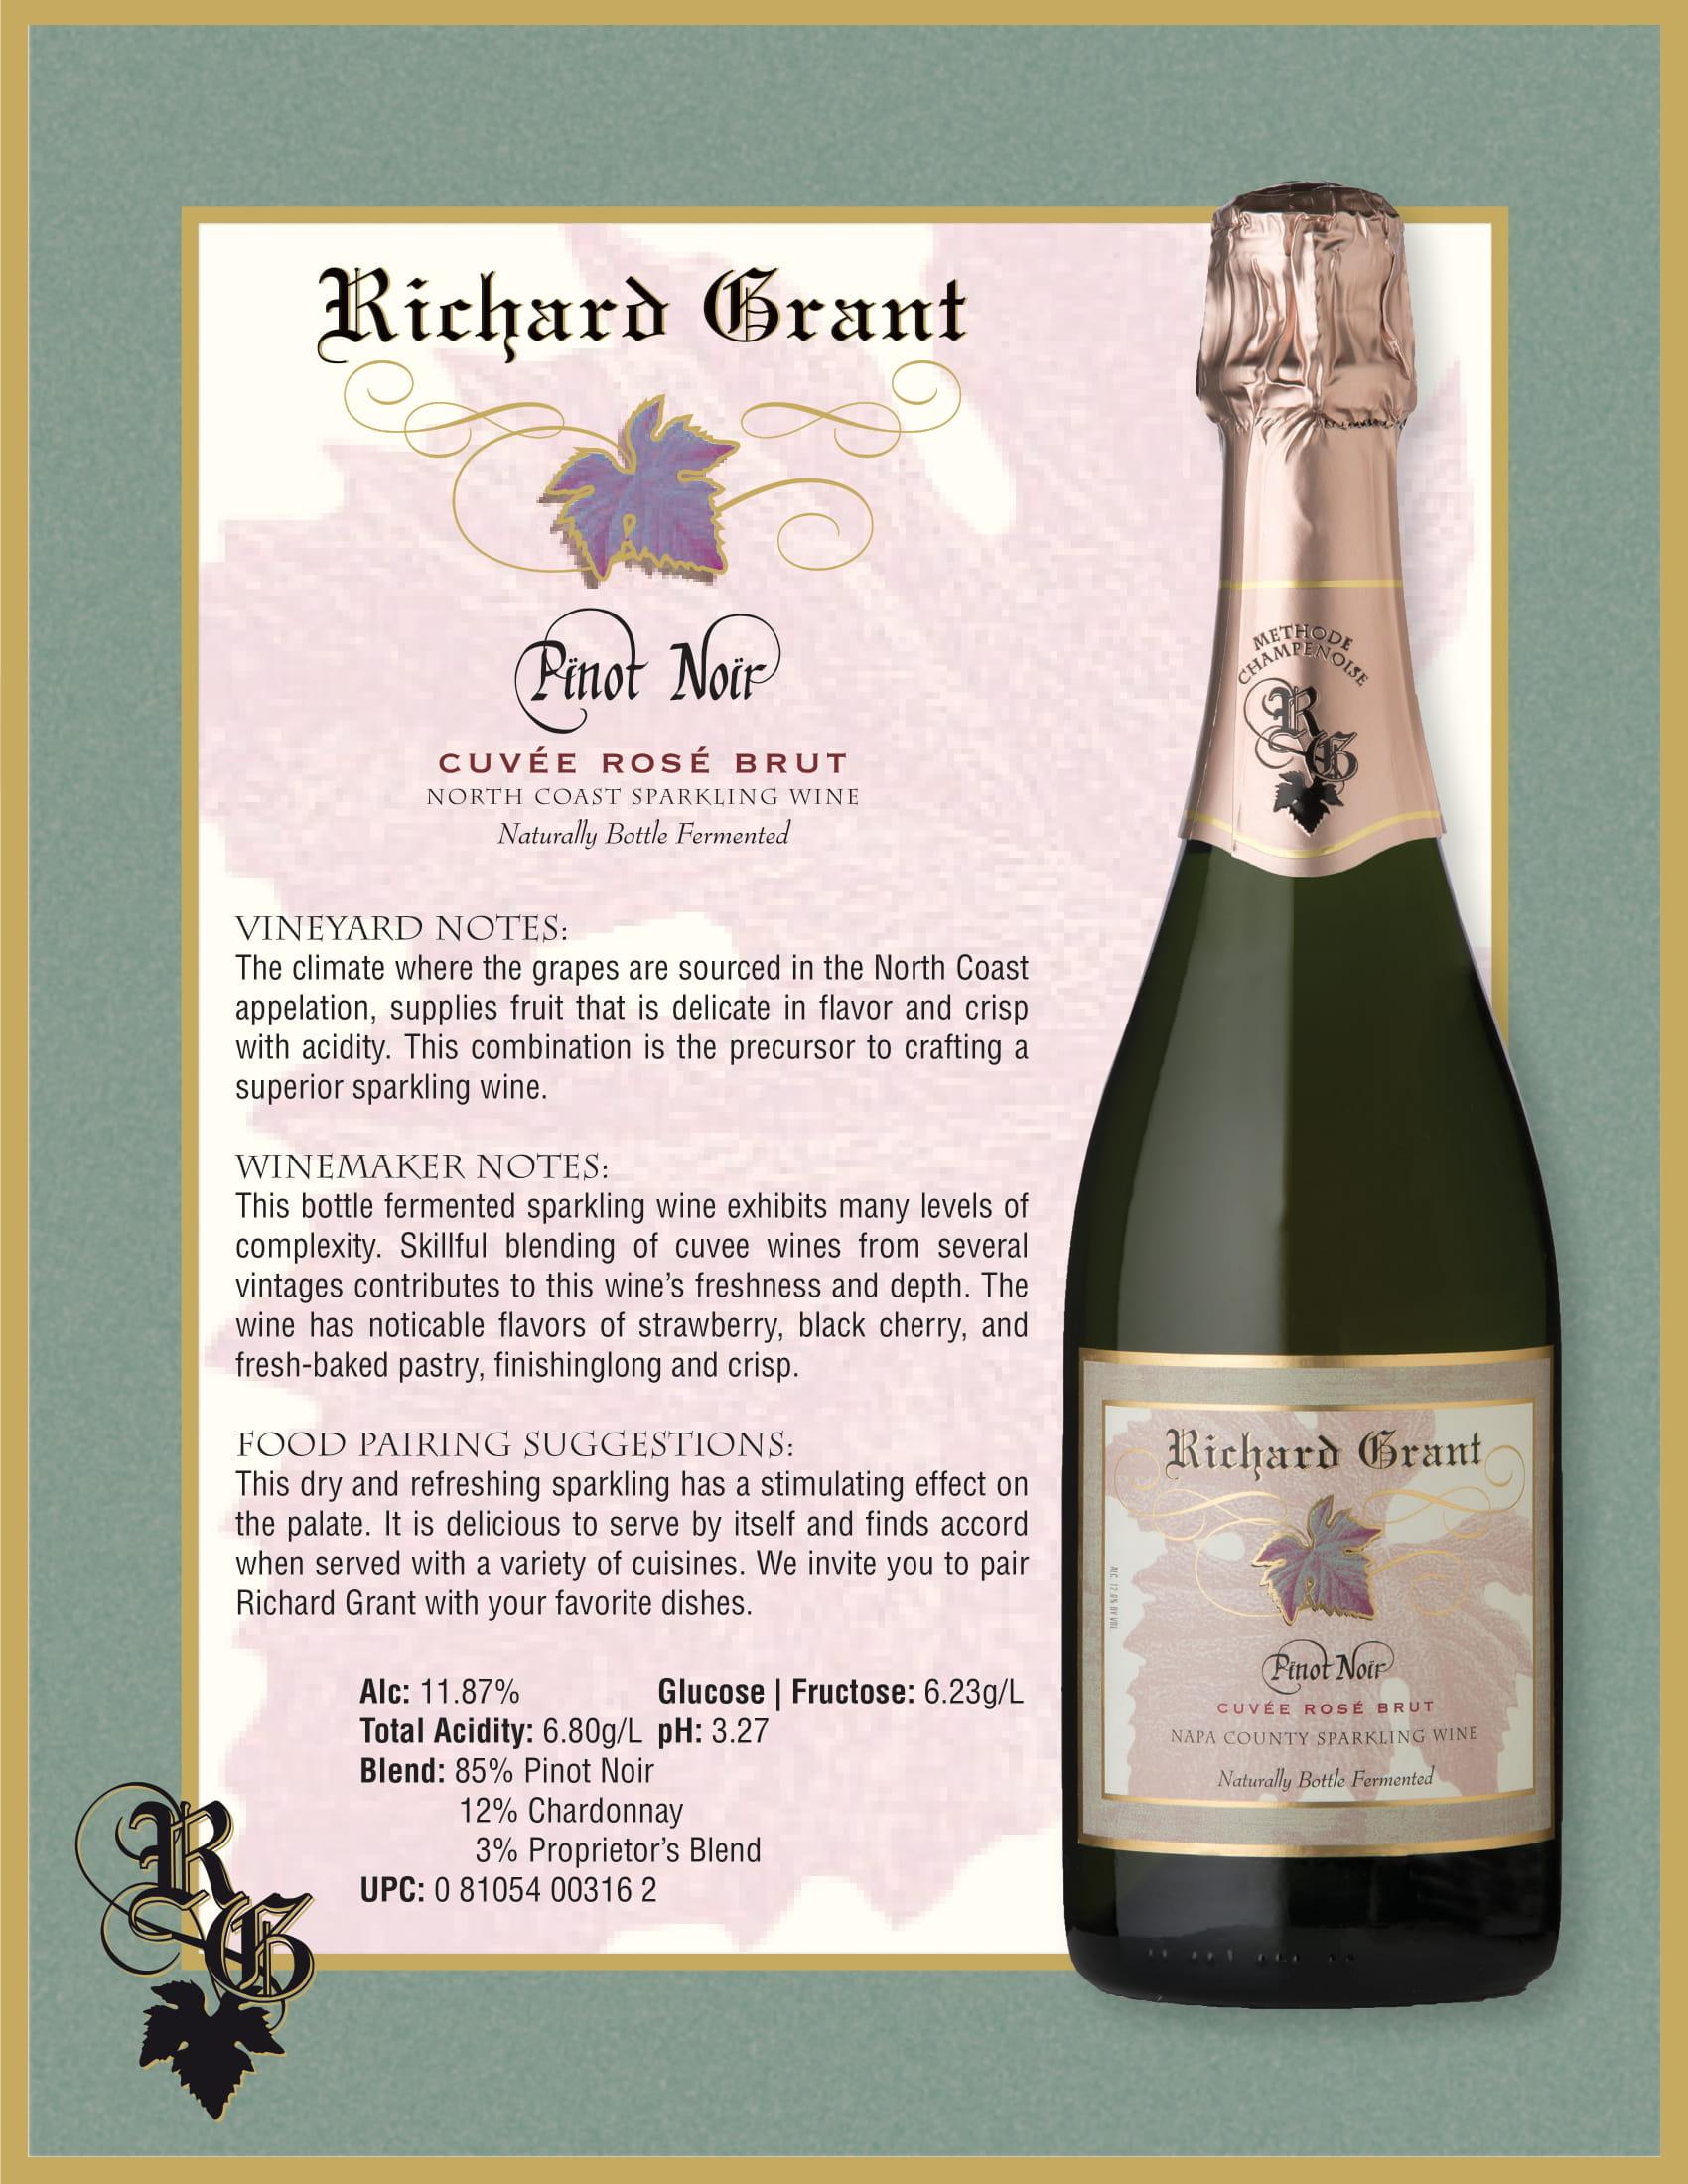 Richard Grant Pinot Noir Cuvée Rosé Brut Tech Sheet